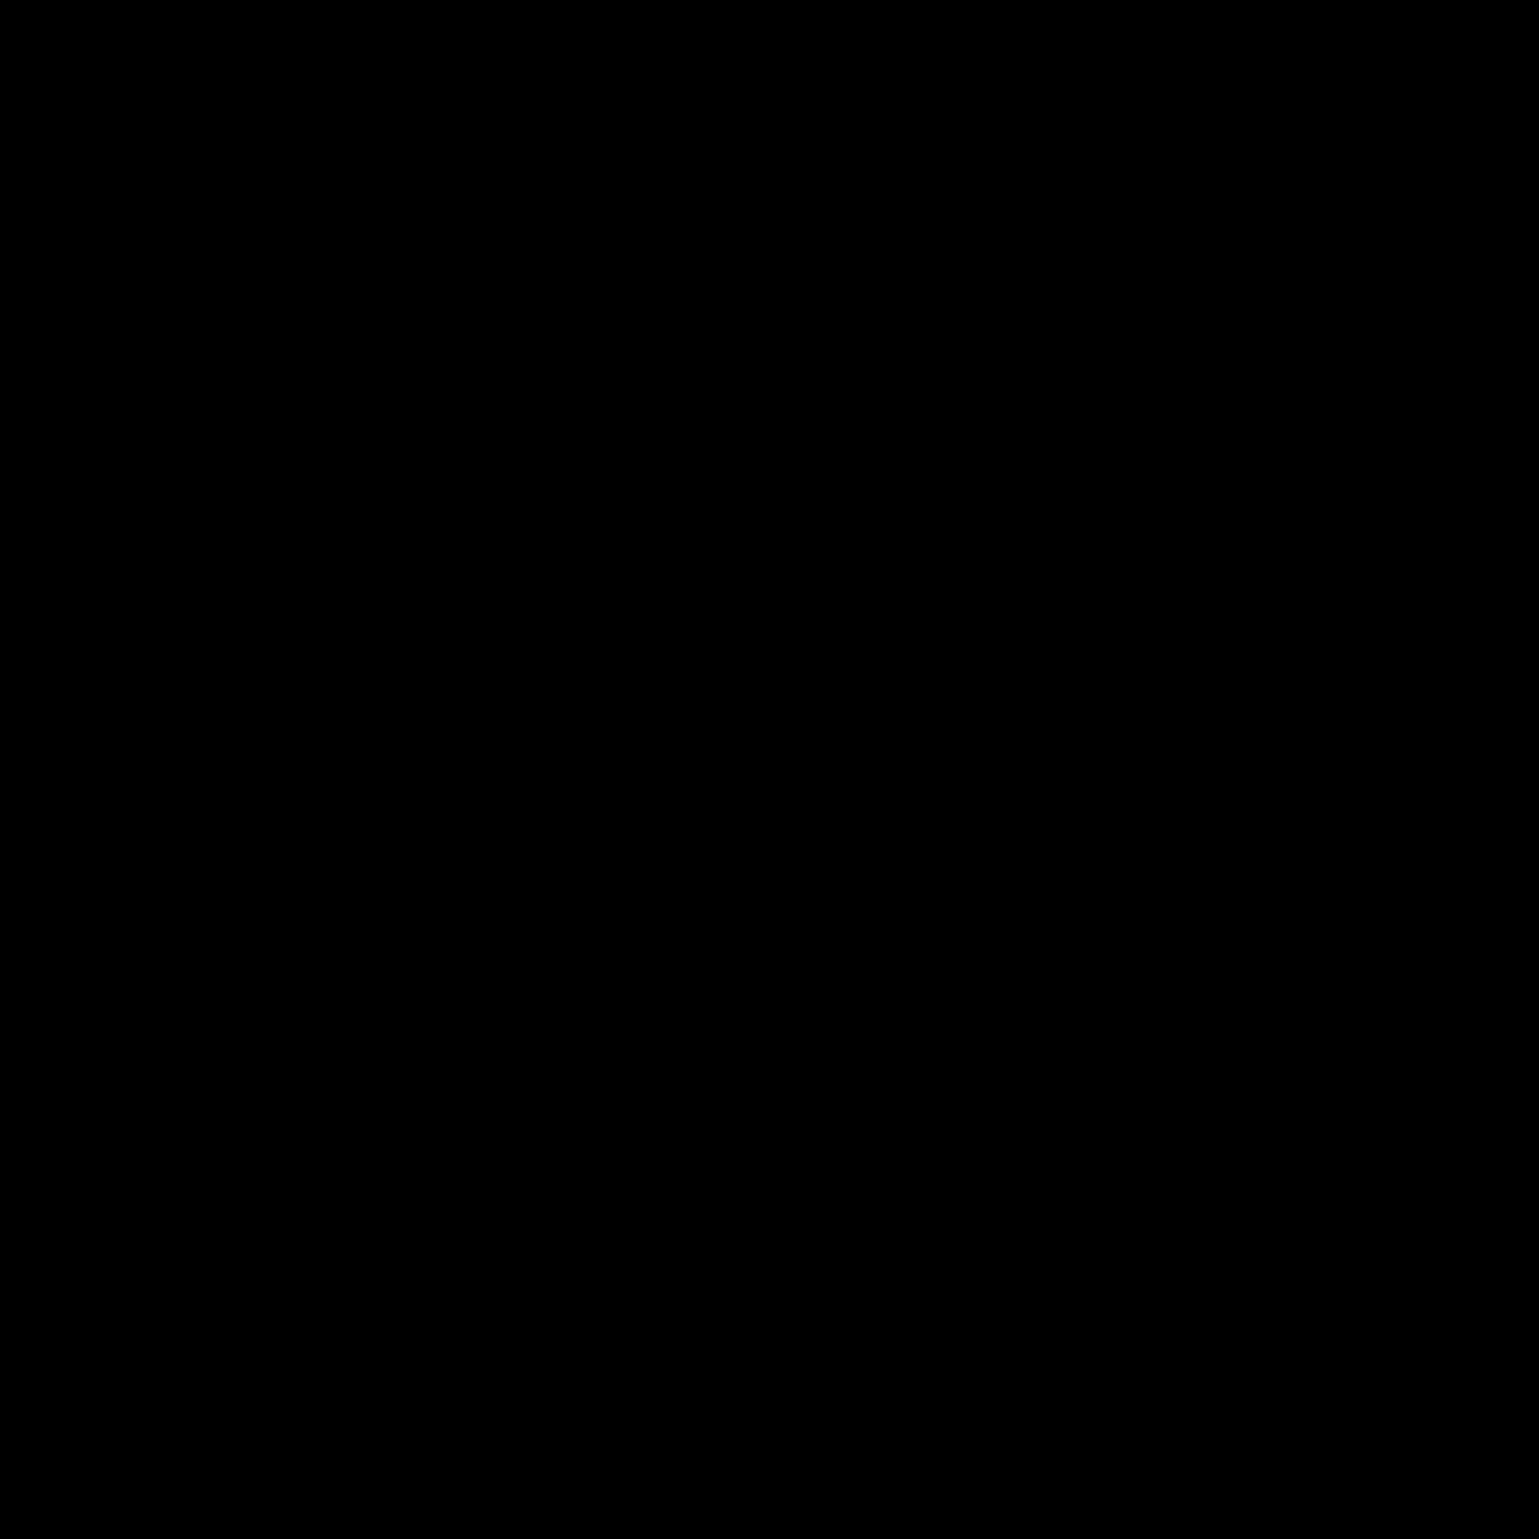 Egg Shape Png Vector Clipart.